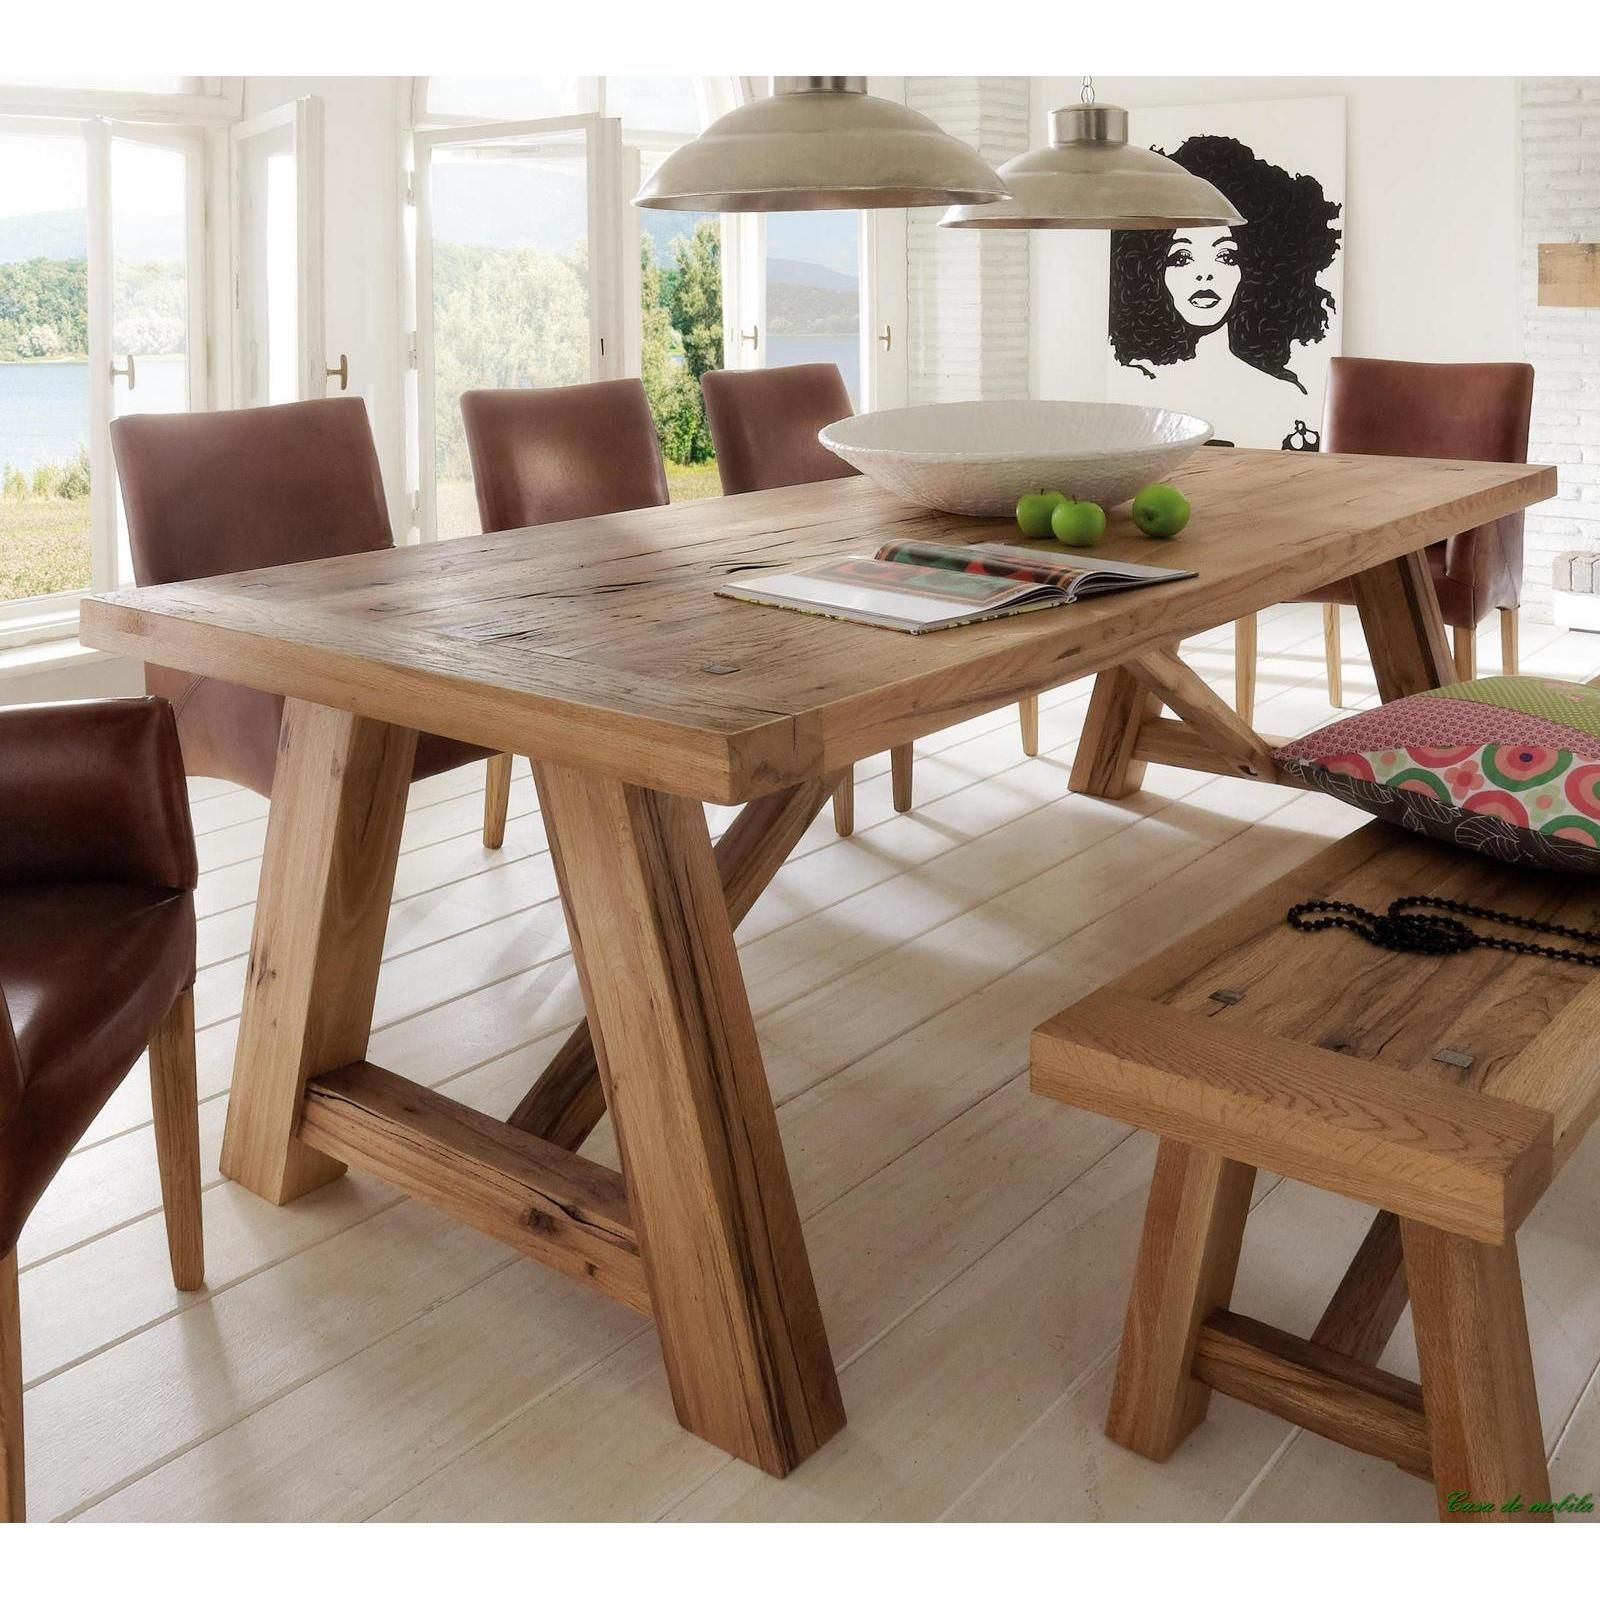 Dining Table Oak 1 German Decor 2019 Home Decor Ad 1